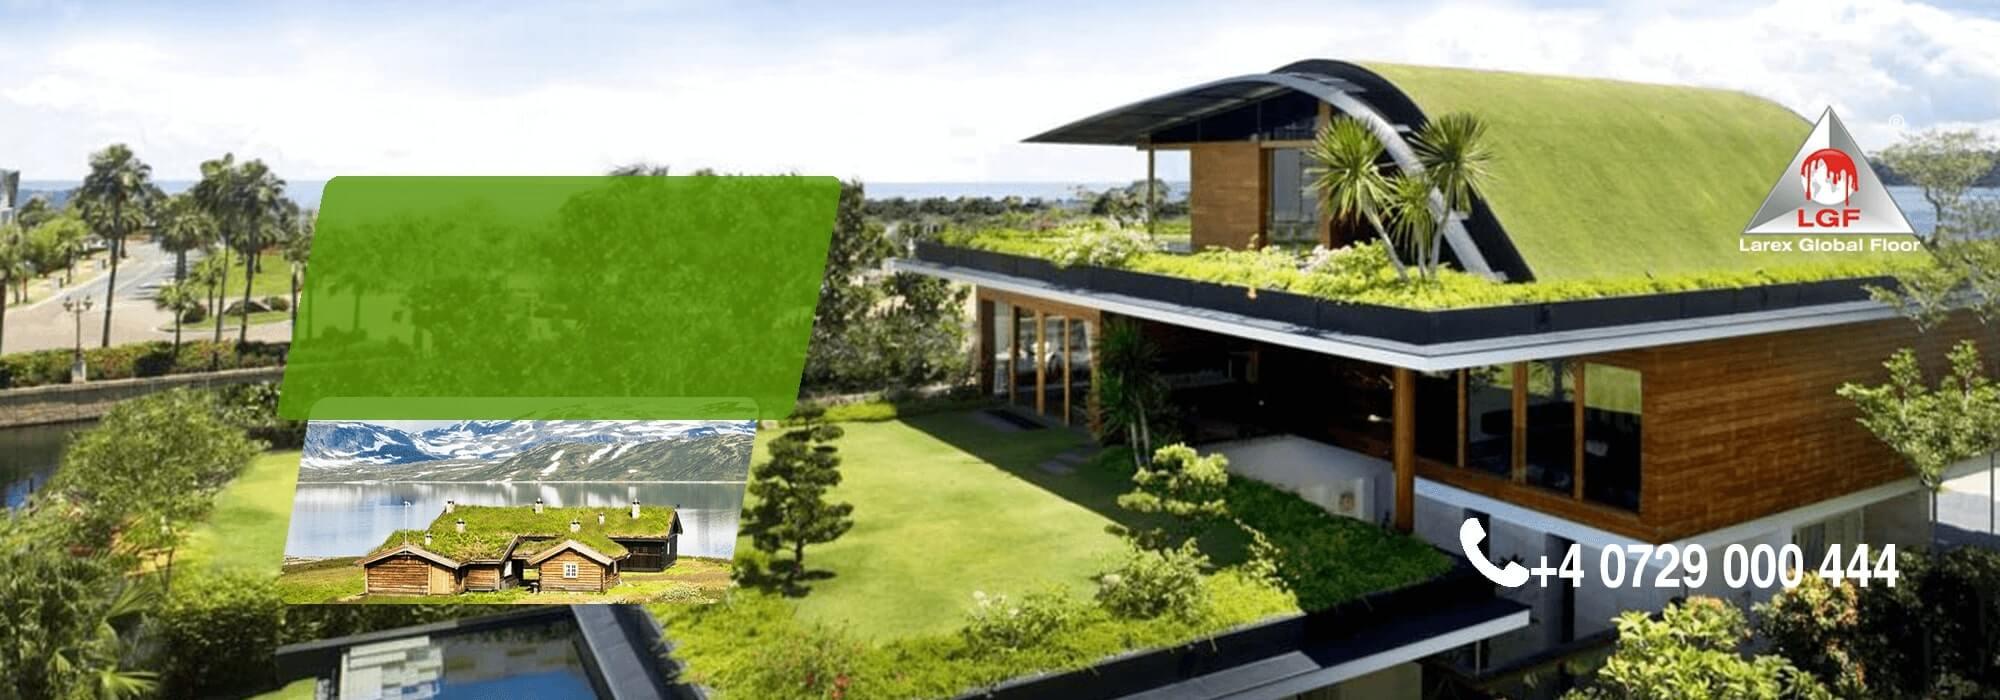 slider hidroizolatii acoperis verde